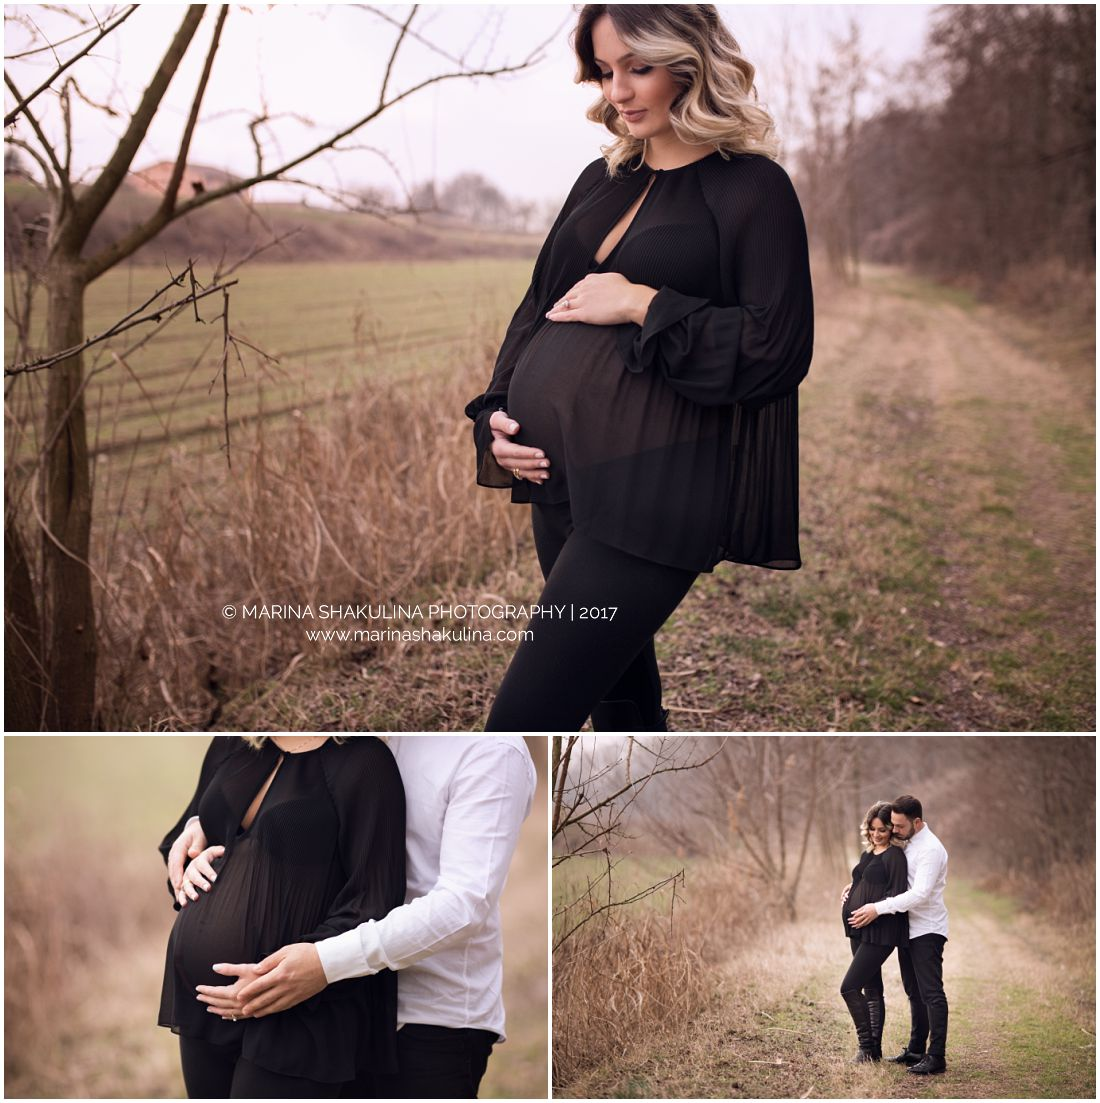 Fotografa di gravidanza a Verona